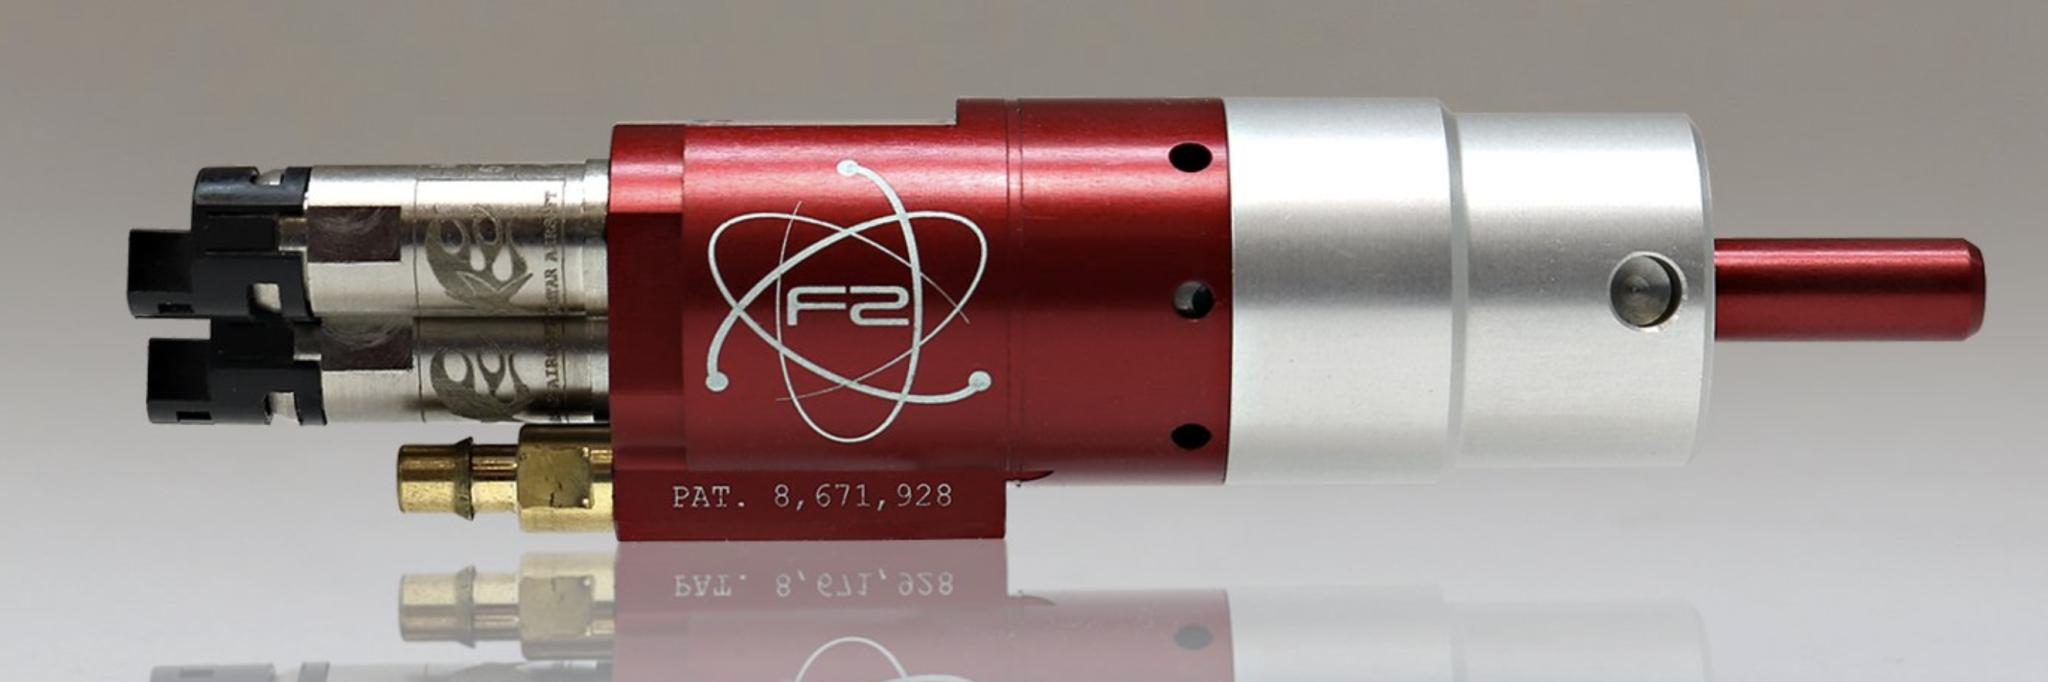 polarstar F2 ™ HPA-Umrüstsatz M4 / m16